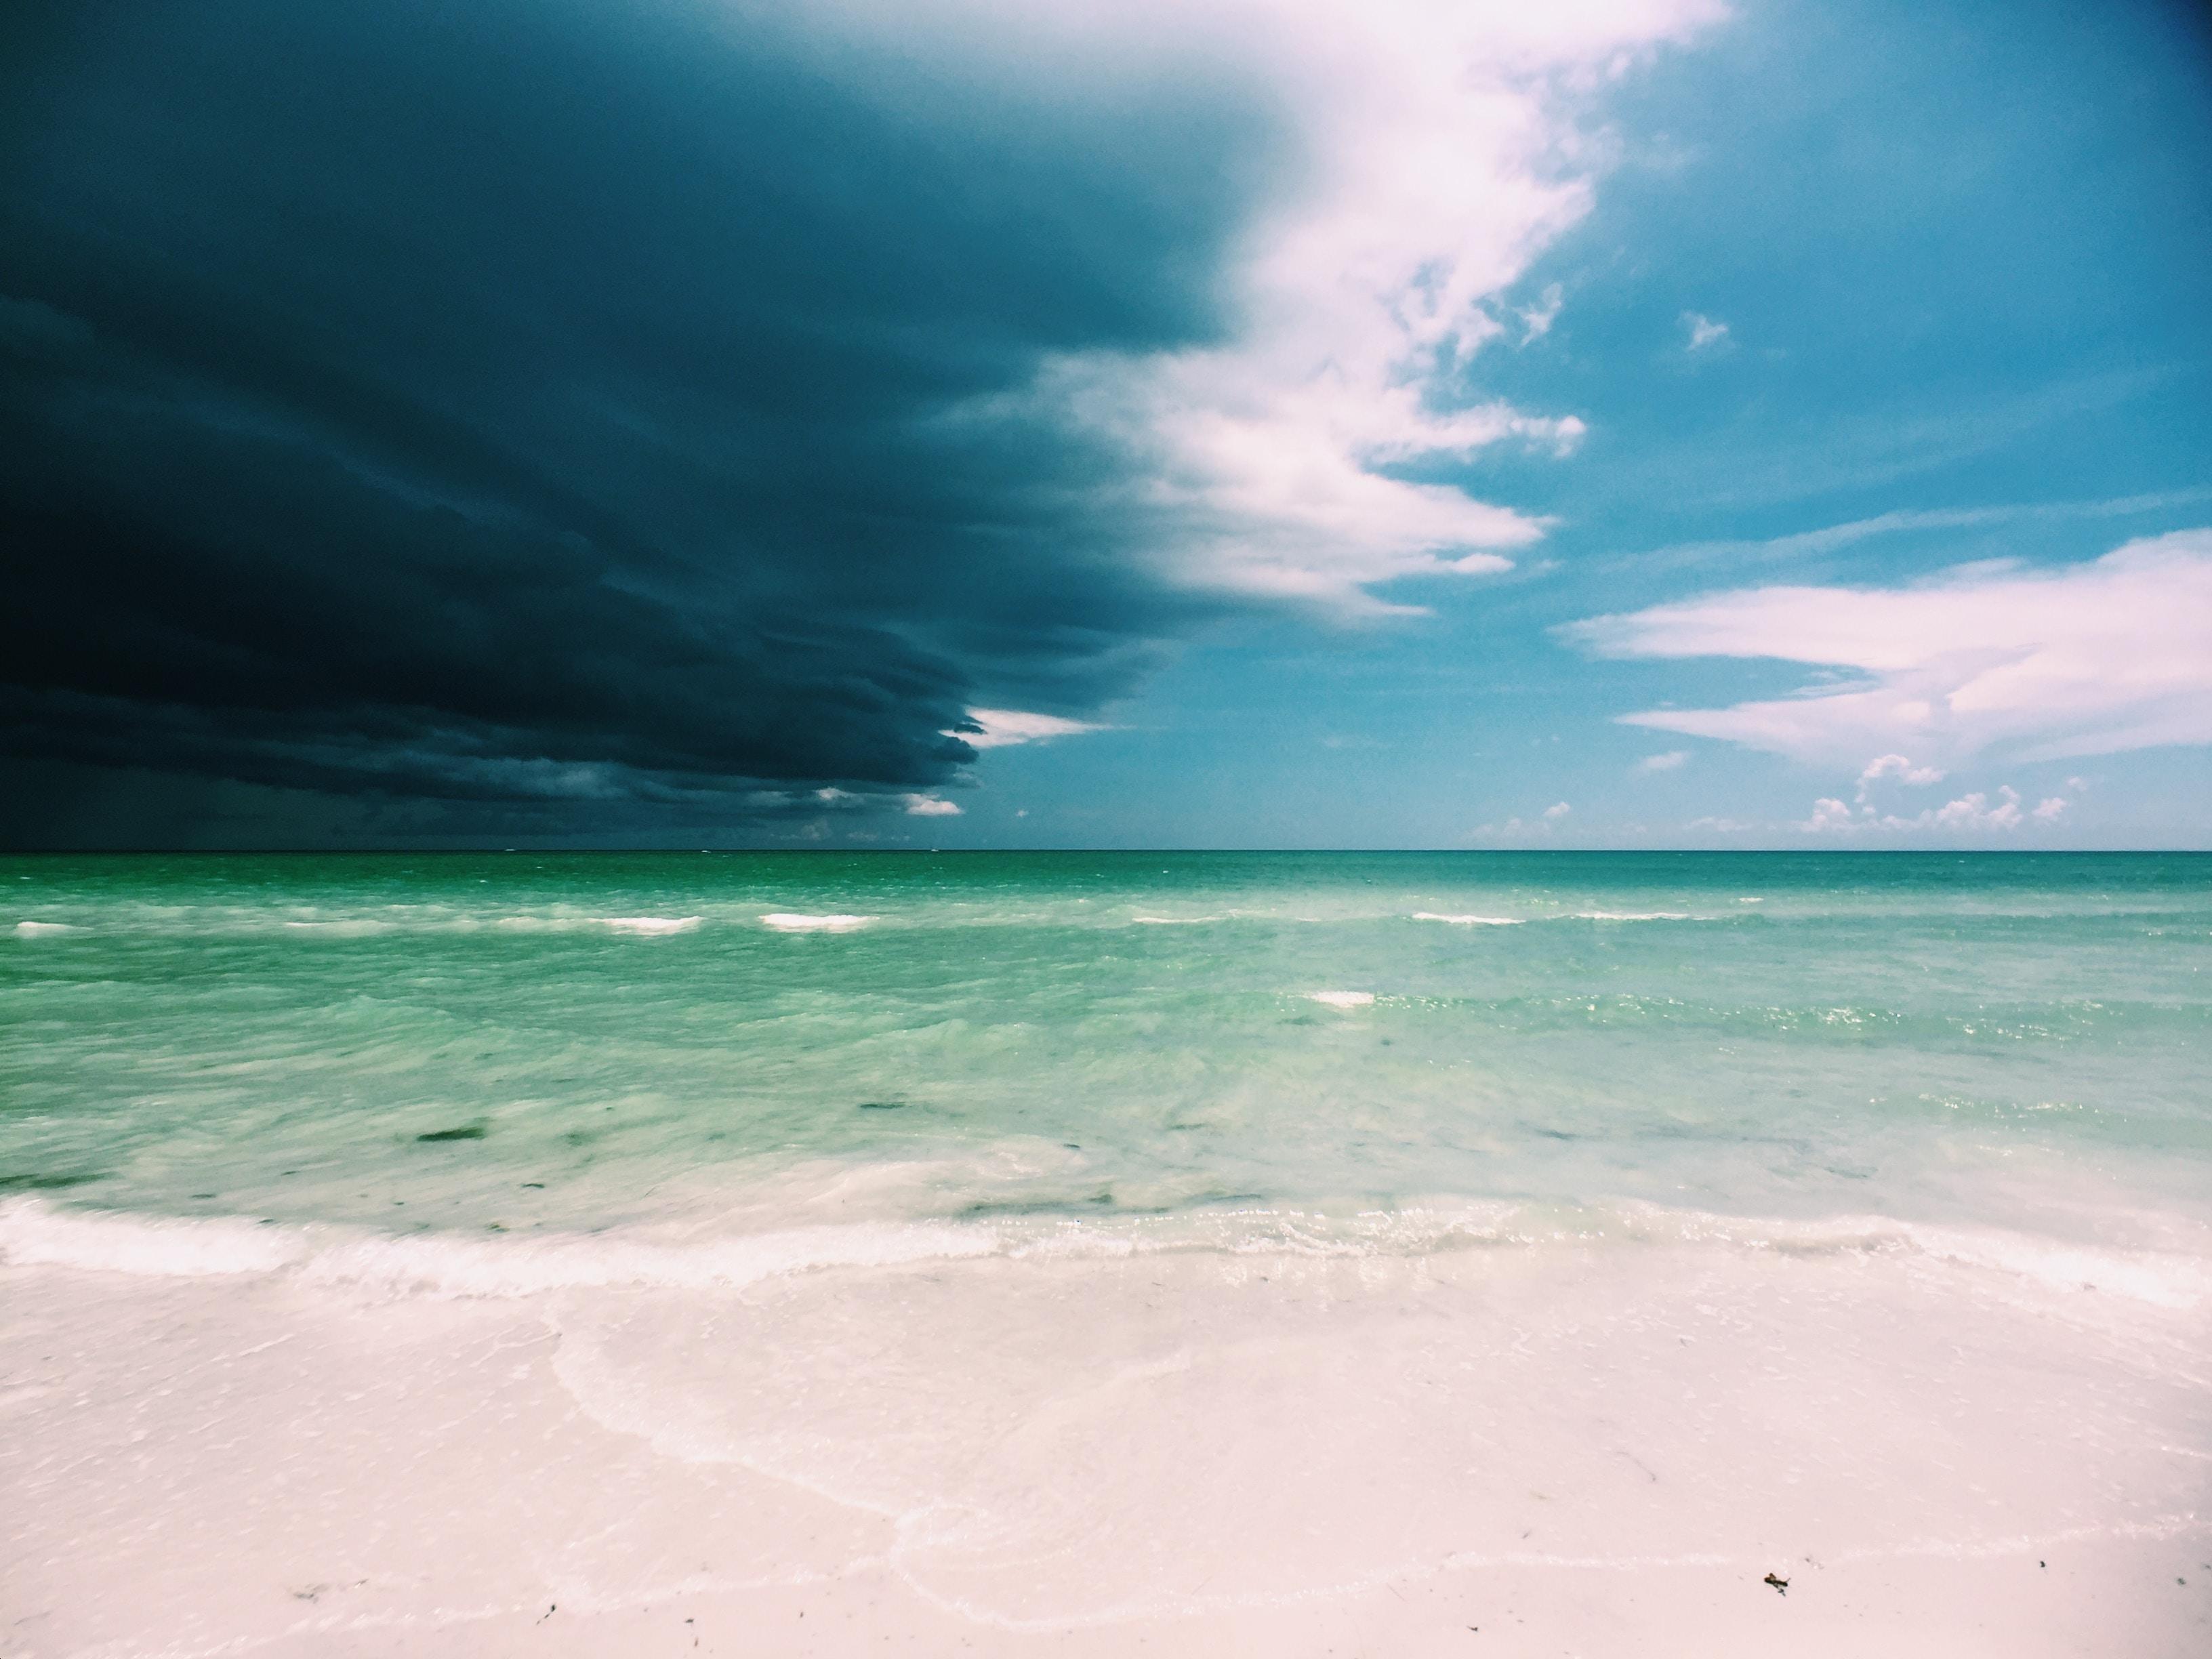 clear white sand beach under cloudy sky